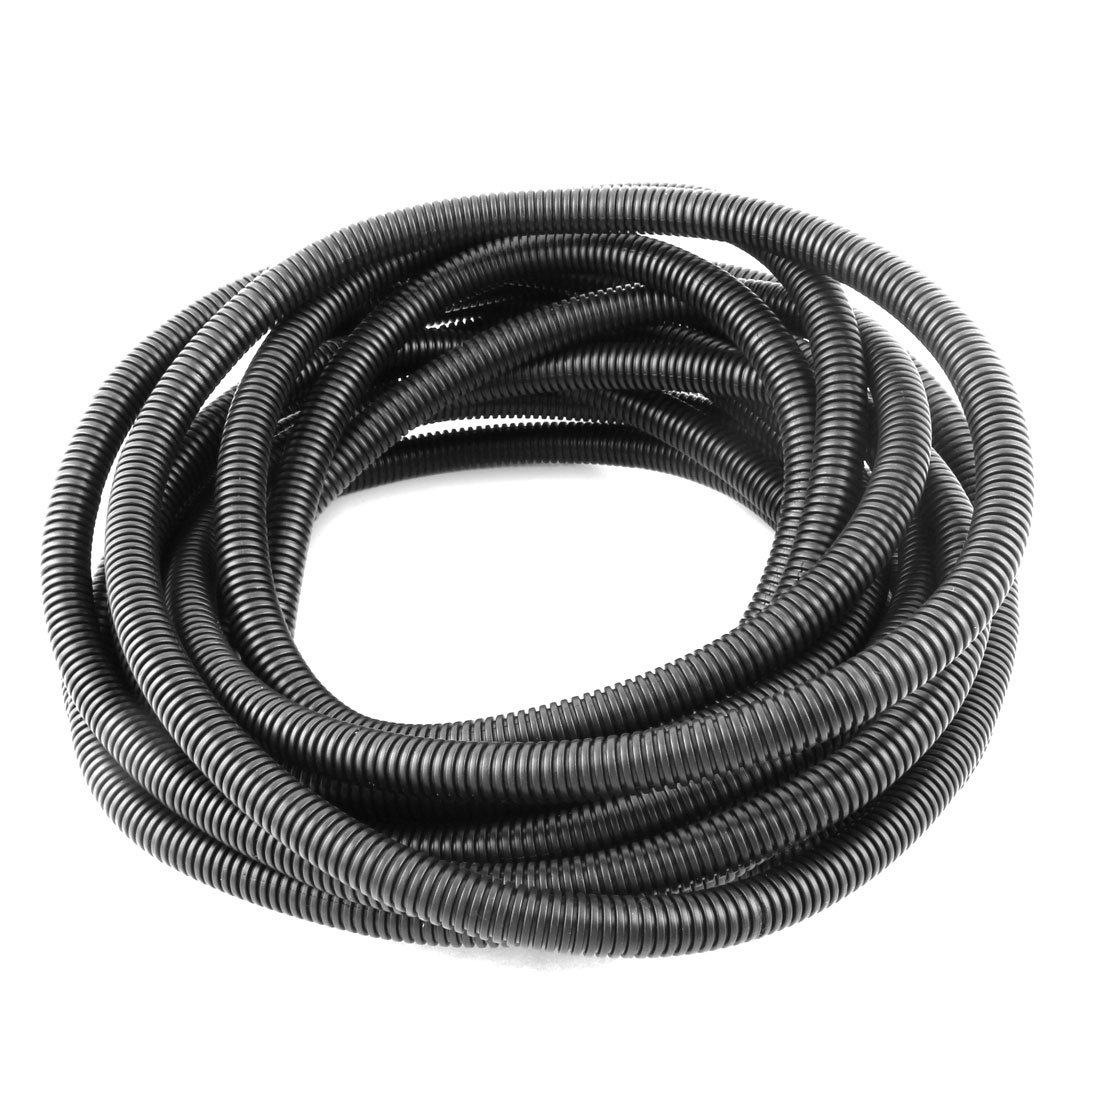 uxcell Plastic 12mm x 16mm Flexible Corrugated Conduit Pipe Hose Tube 10M Long Black